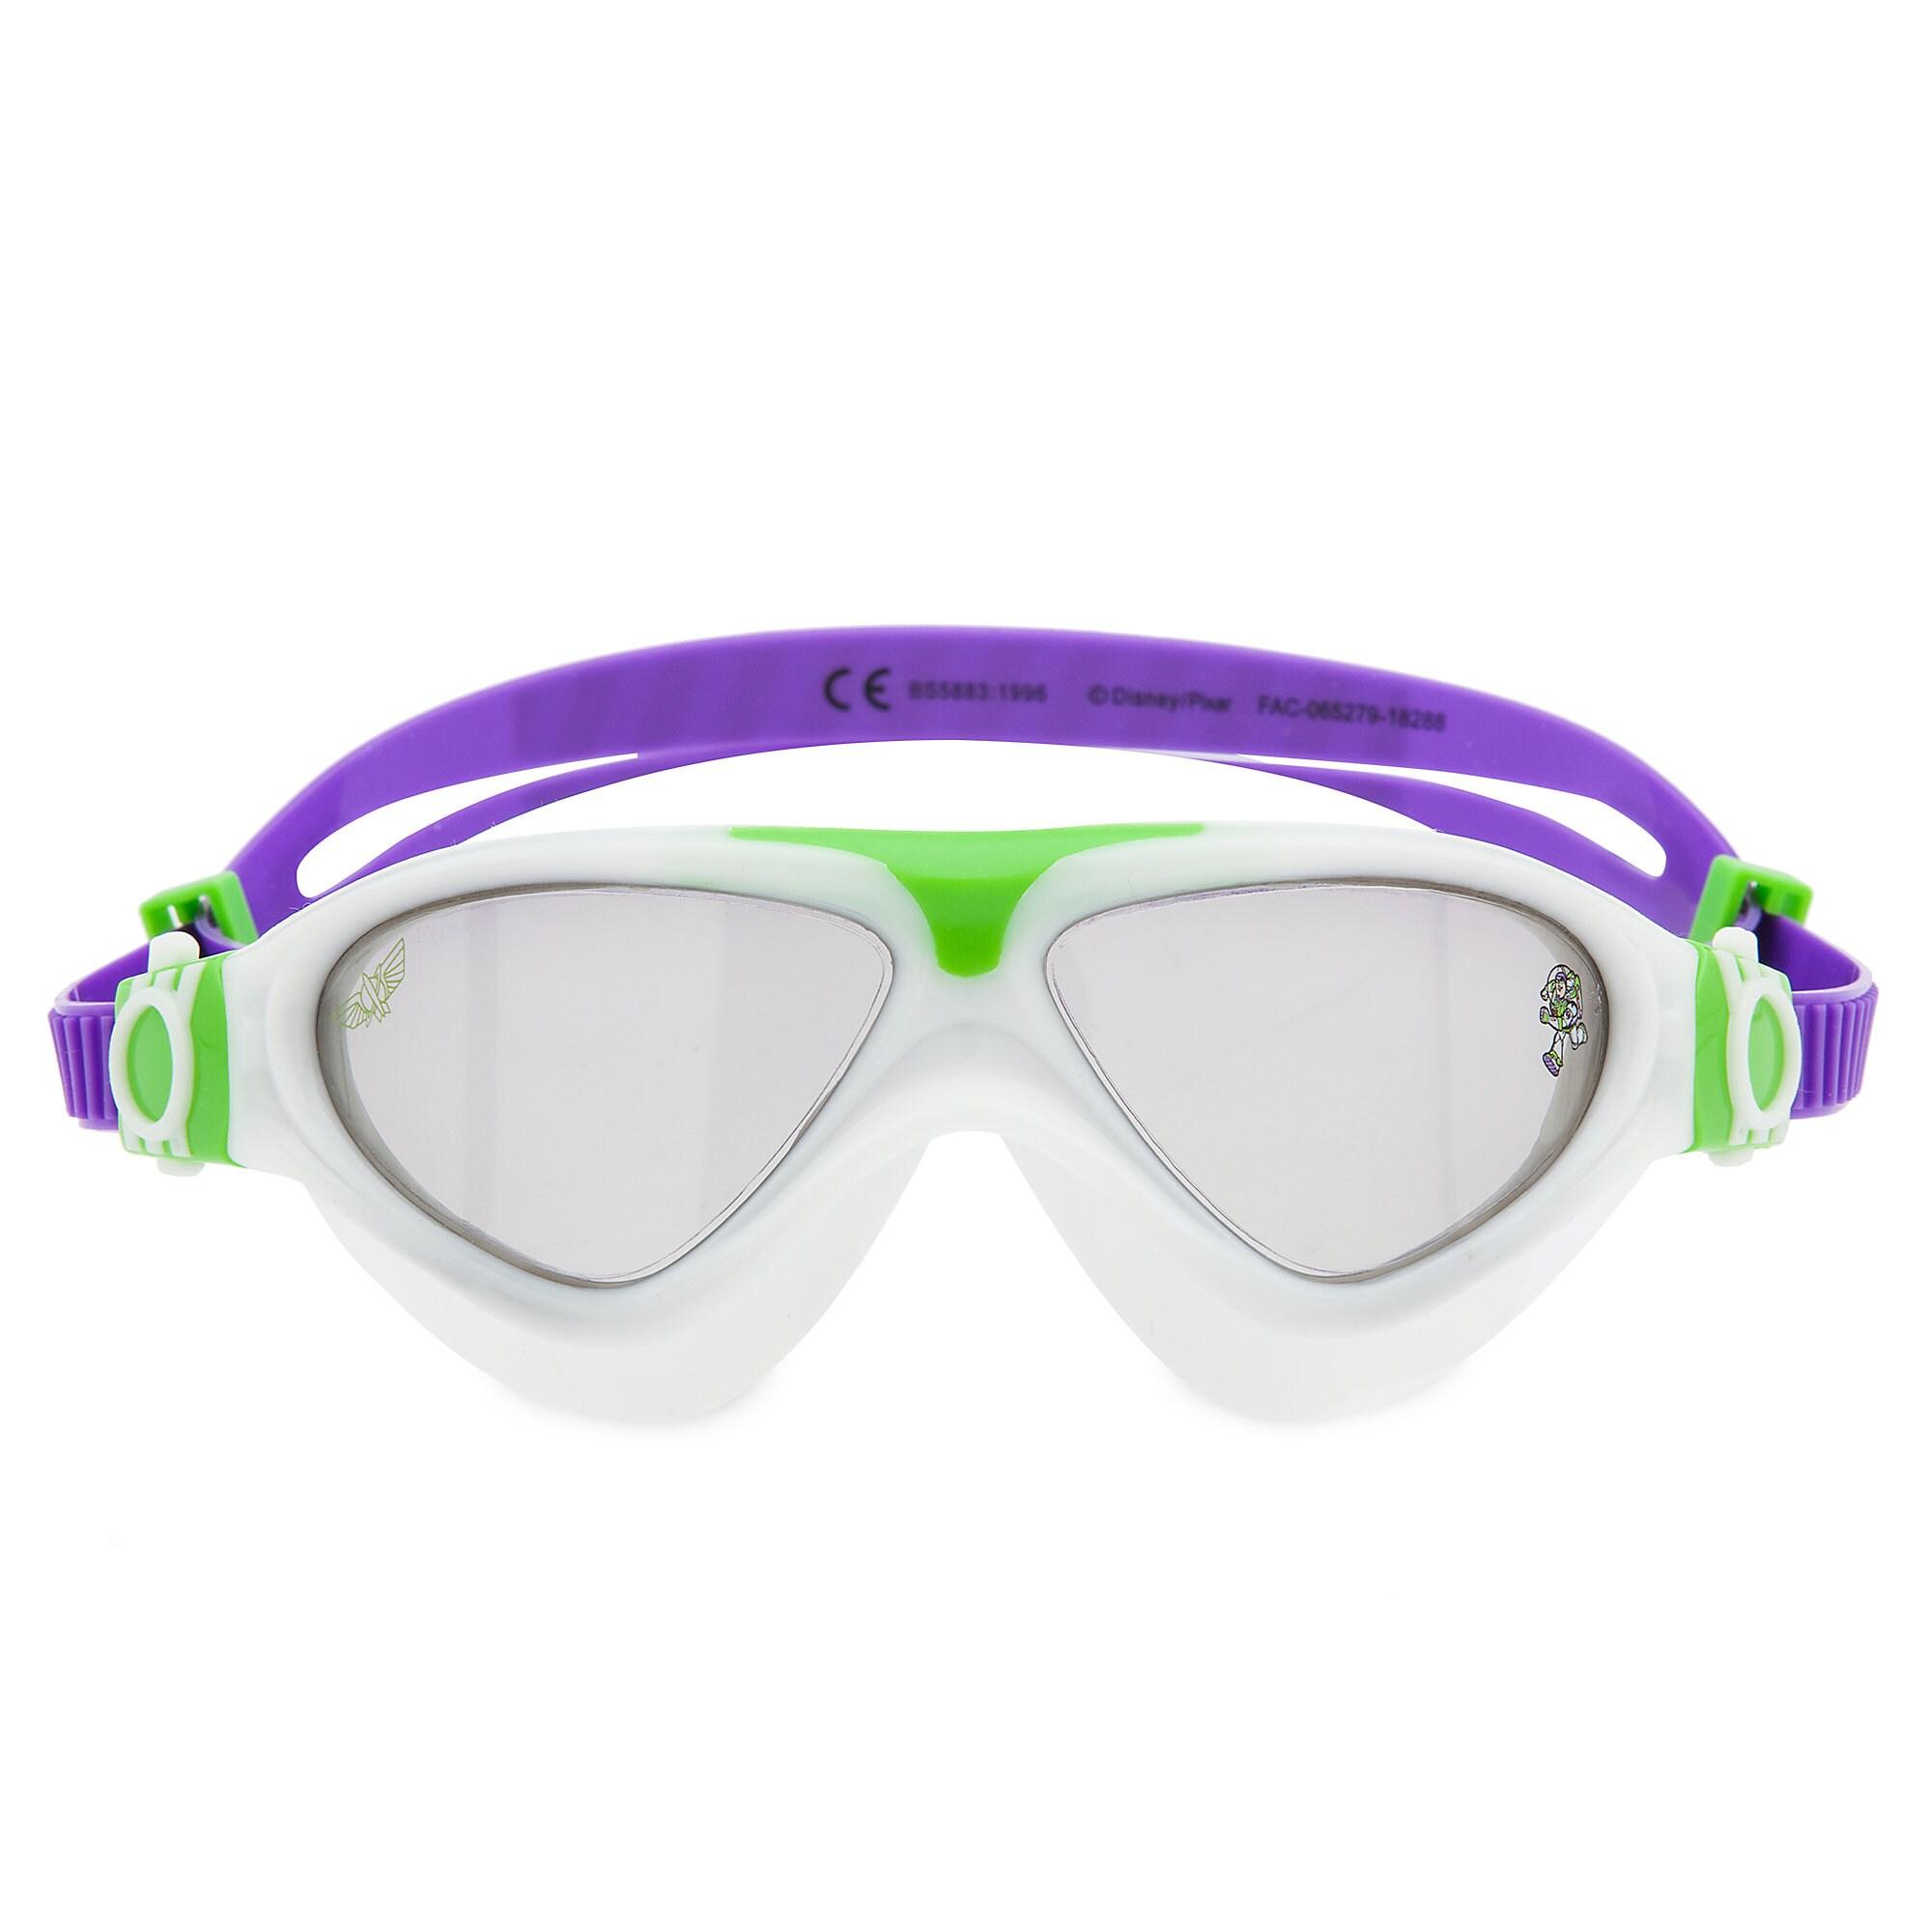 Disney Princess Character Swimming Kids Goggles Boys Girls Swimmer Essentials